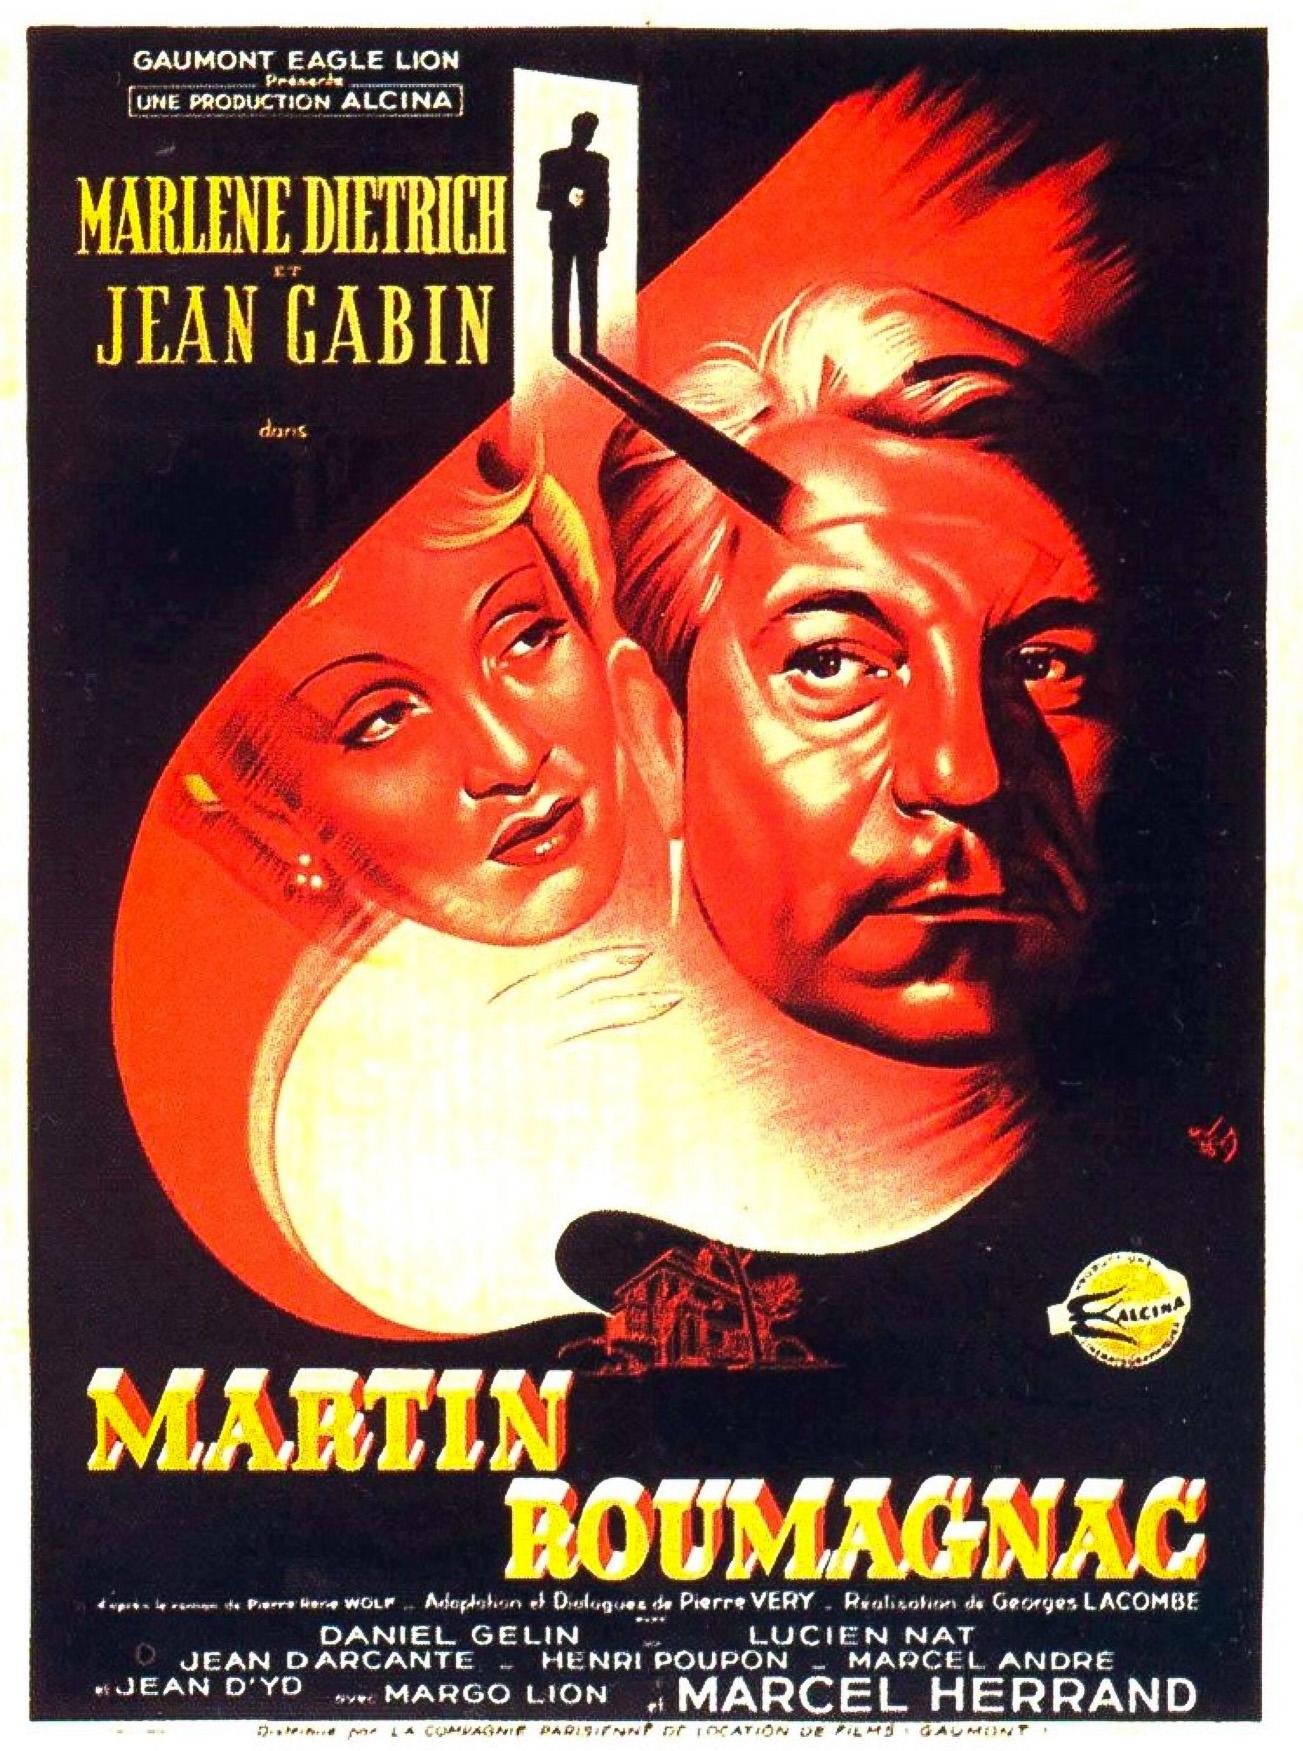 """Мартен Руманьяк"", Франция, 1946, Gaumont, Alcina, режиссёр Жорж Лакомб, автор сценария Пьер Вери, композитор Джованни Фуско"